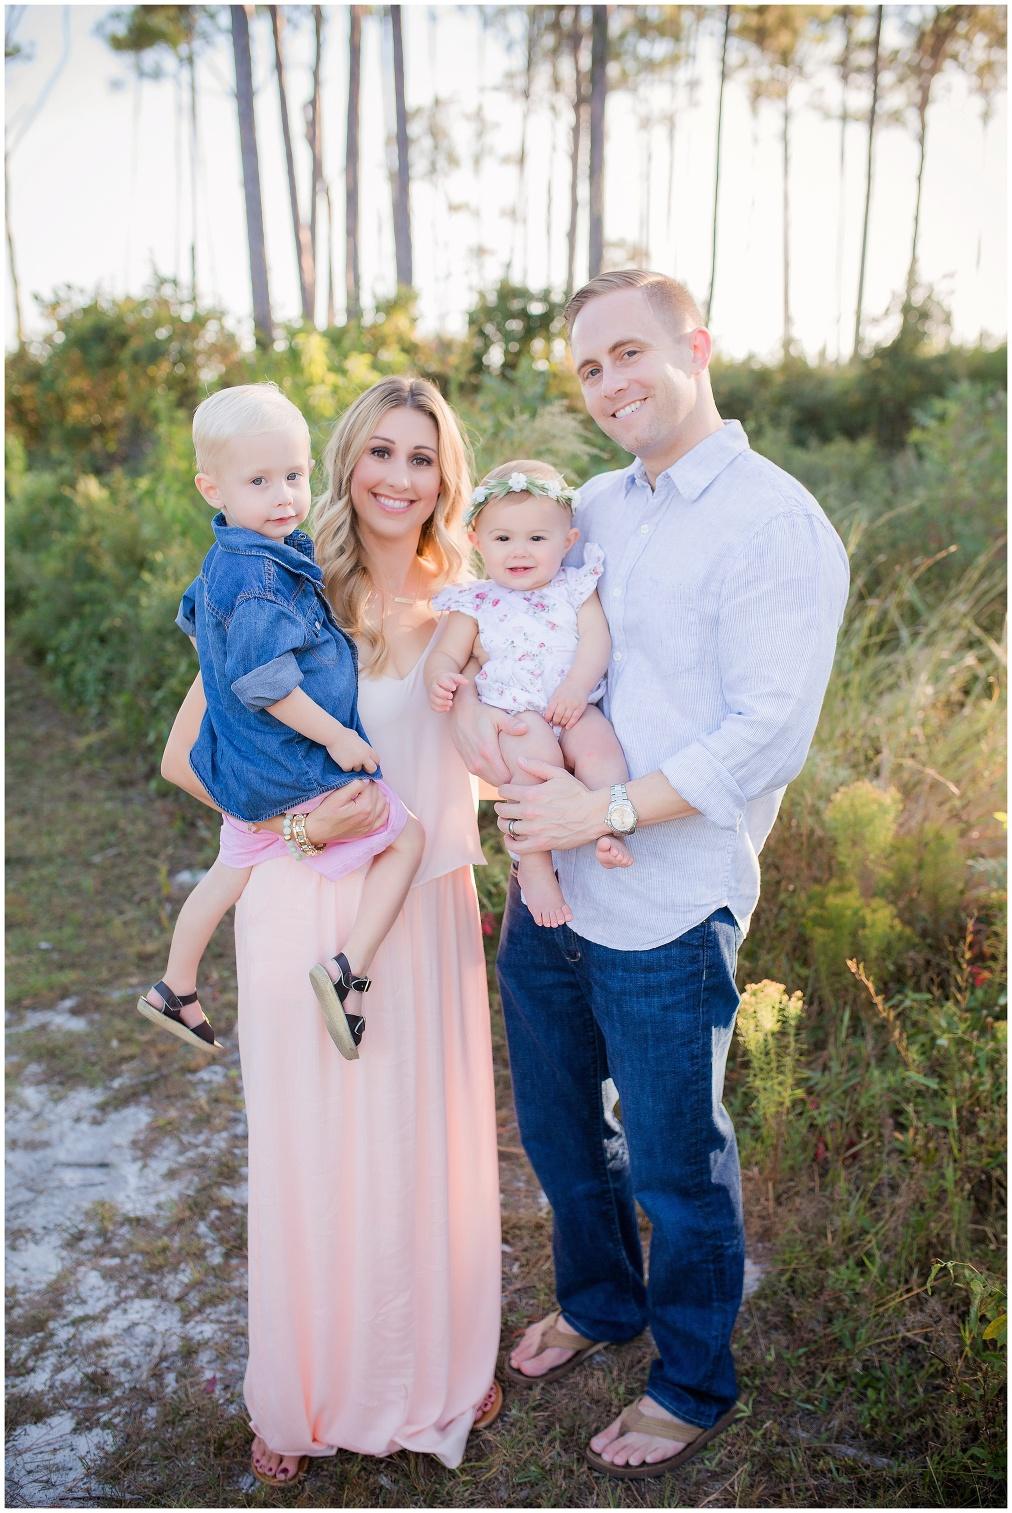 Pensacola Florida Family Photographer | Annabelle Rose Photography_0144.jpg